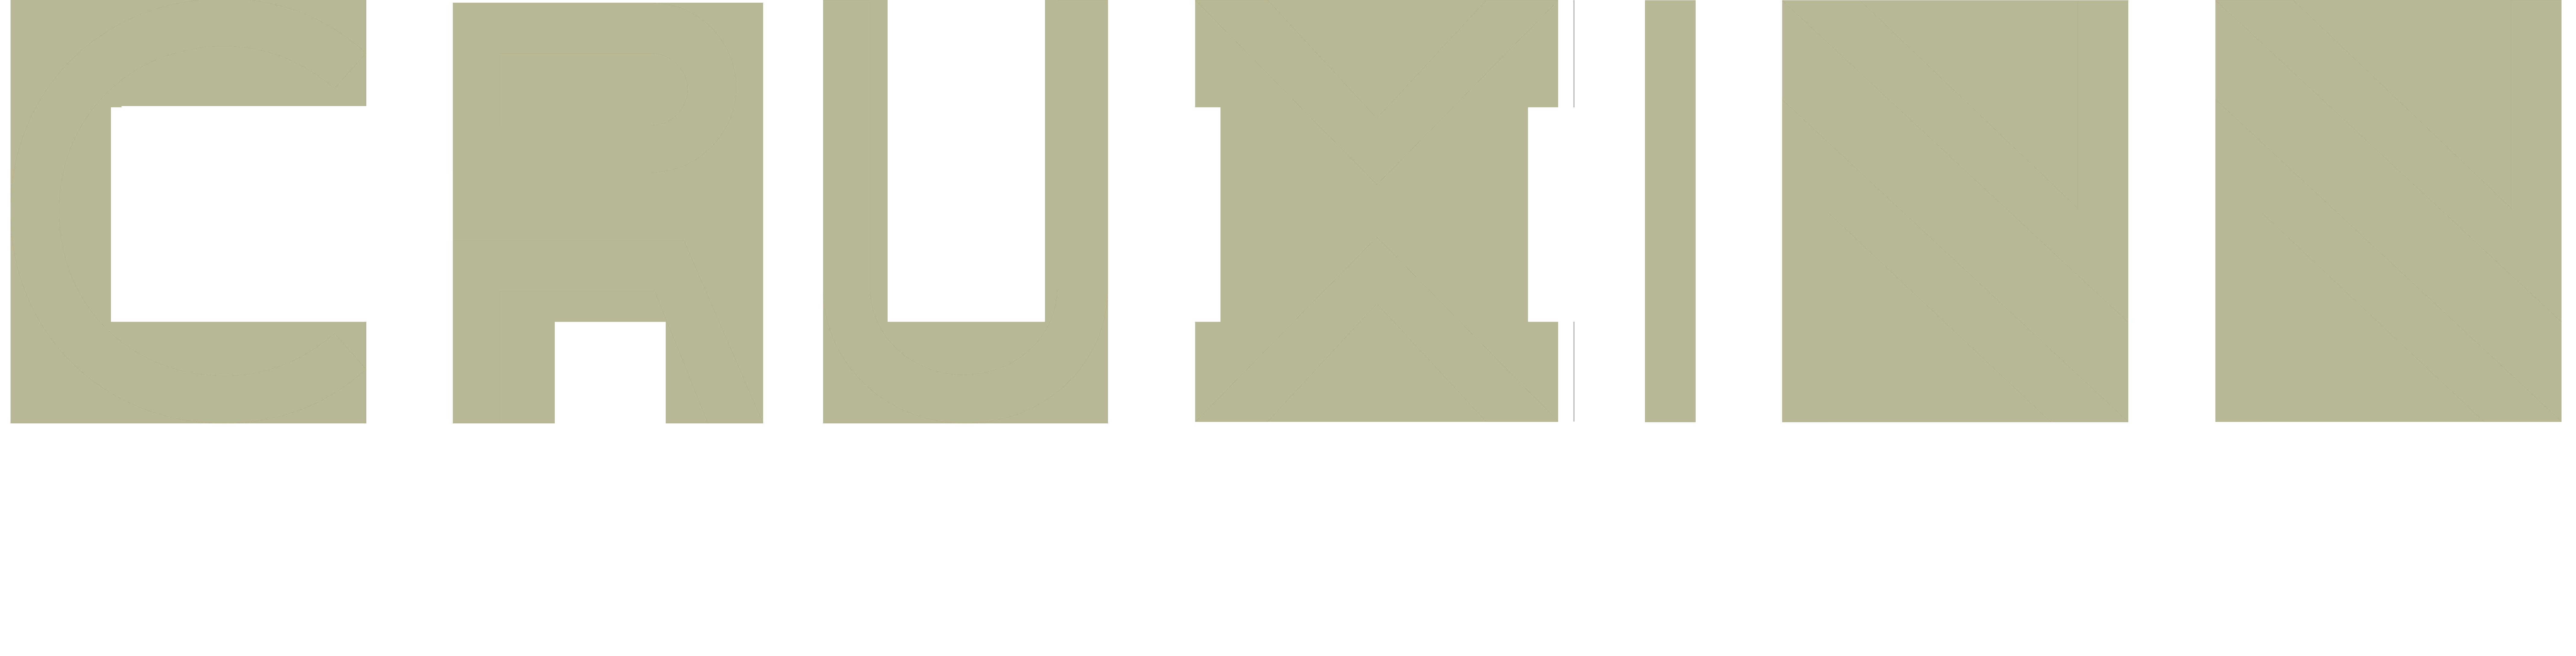 CruxInfinity